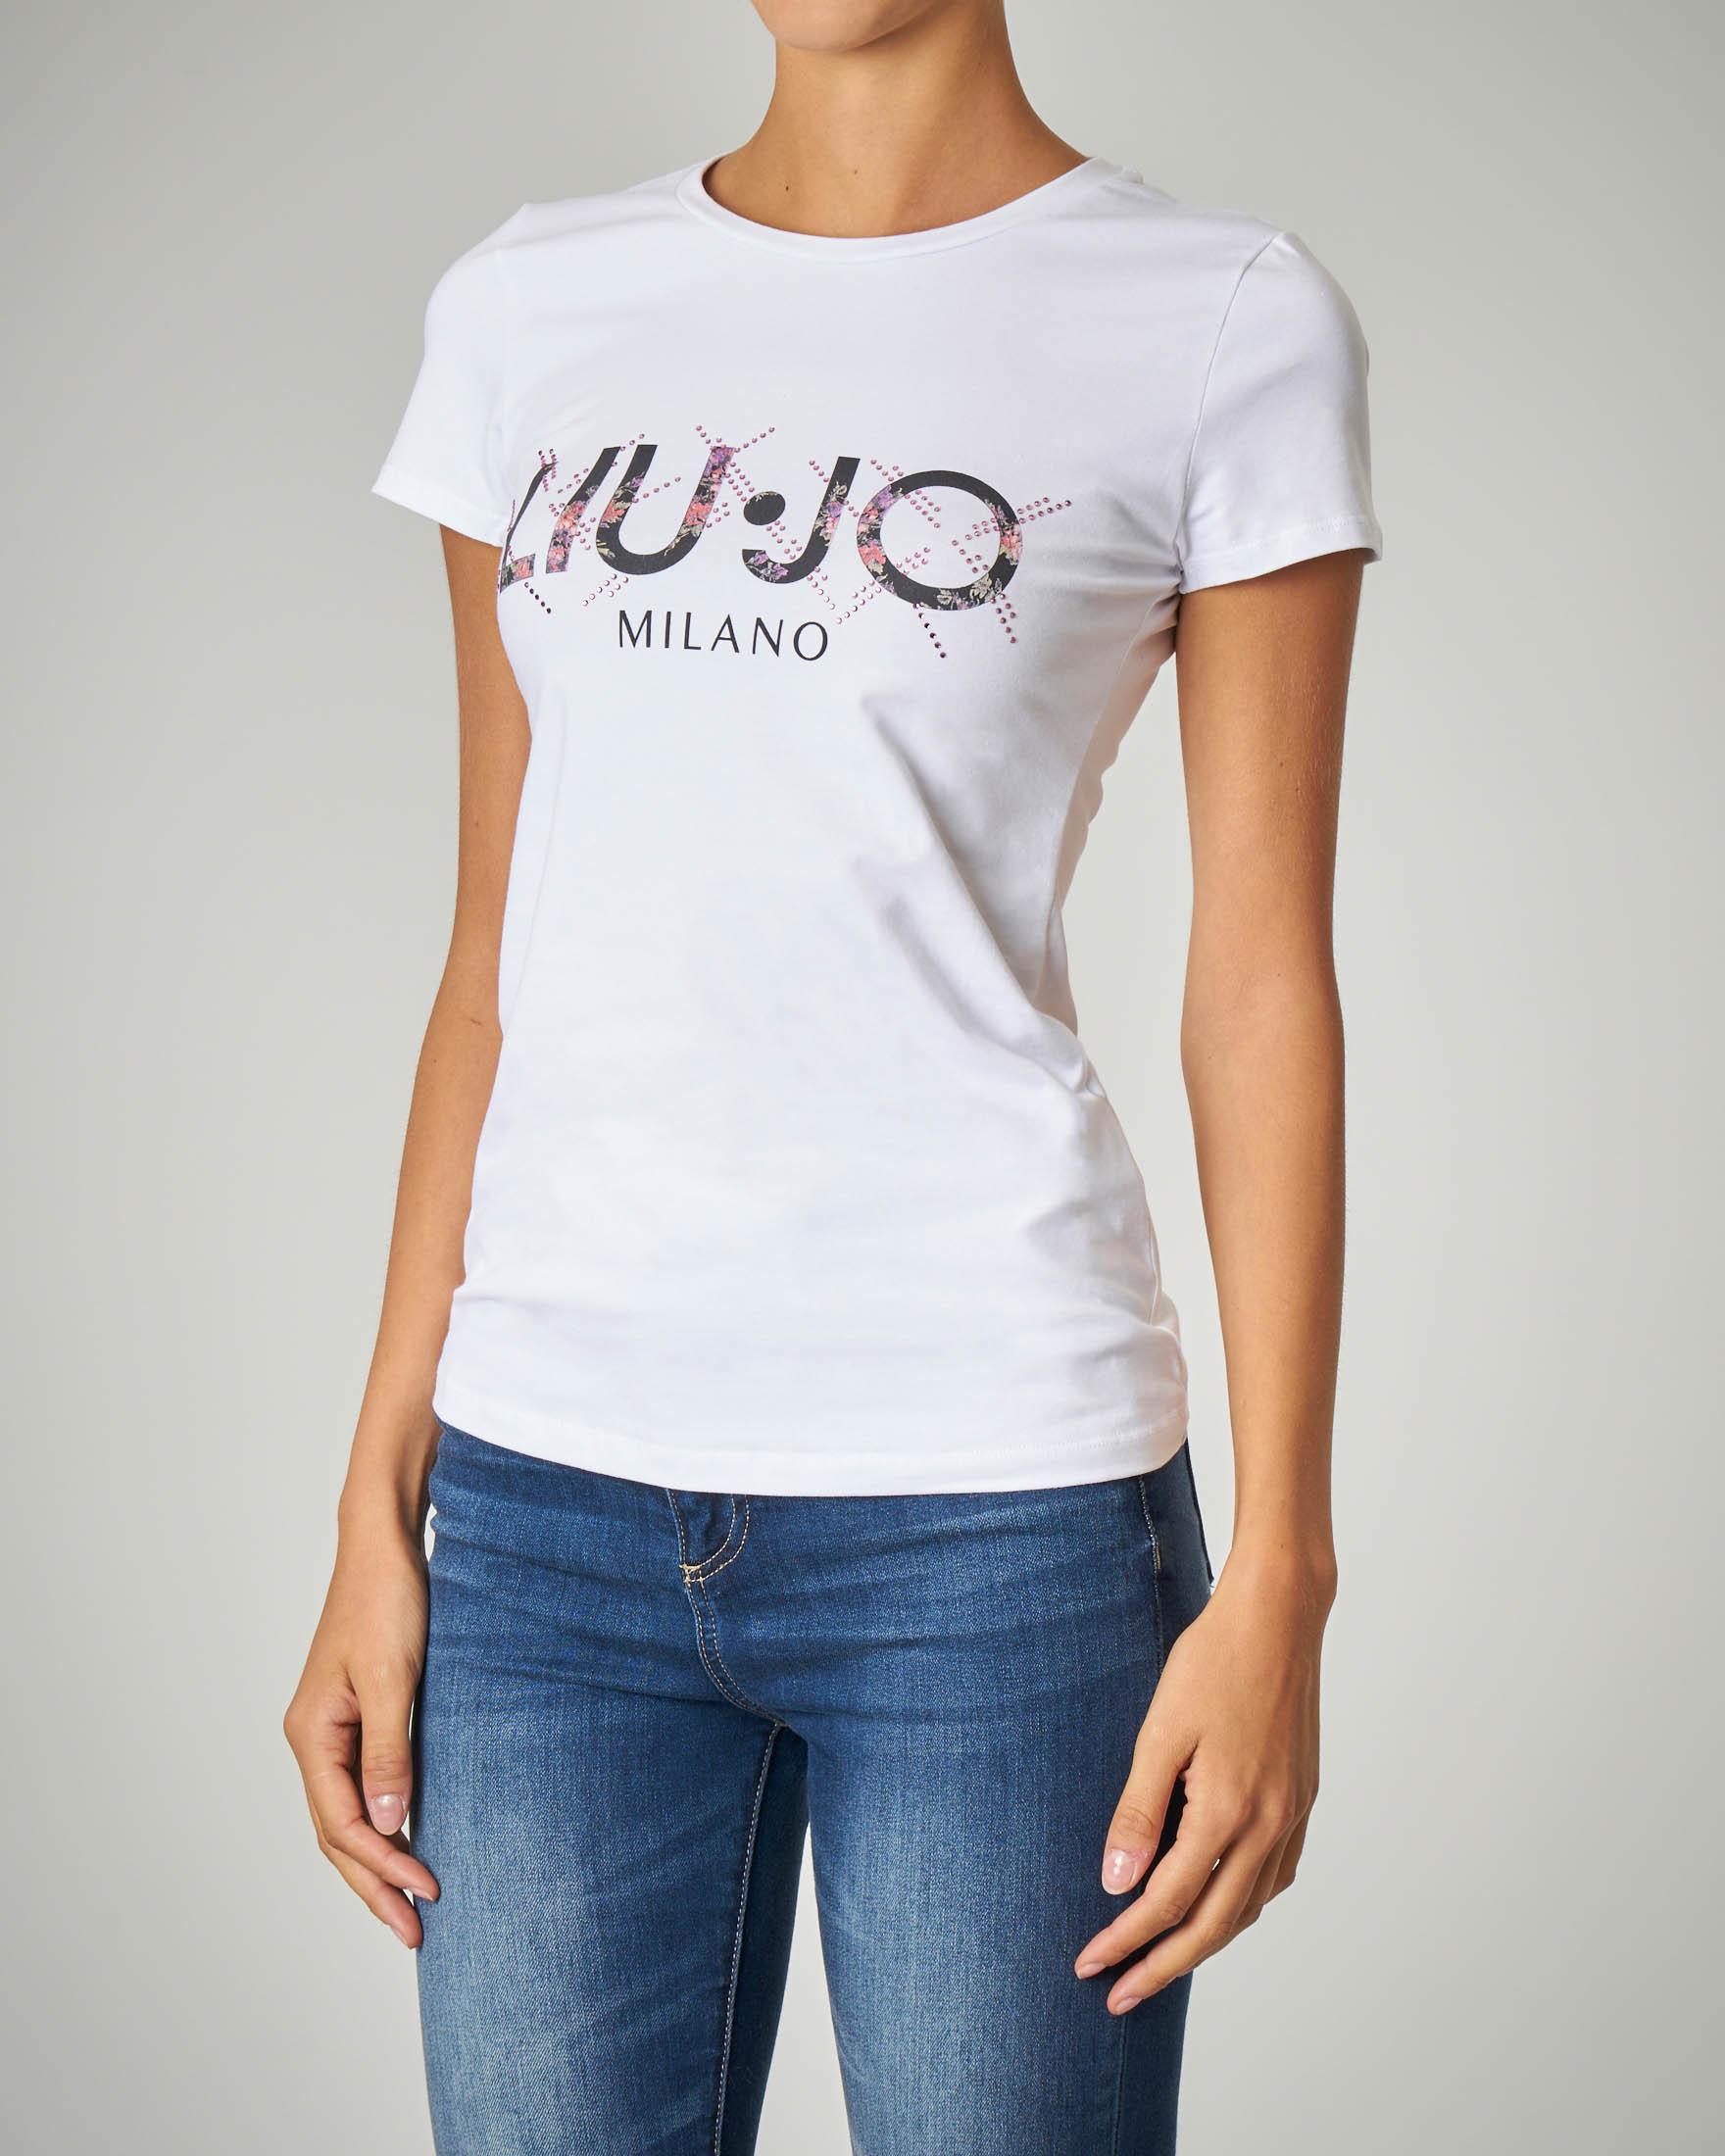 T-shirt bianca in cotone stretch con logo